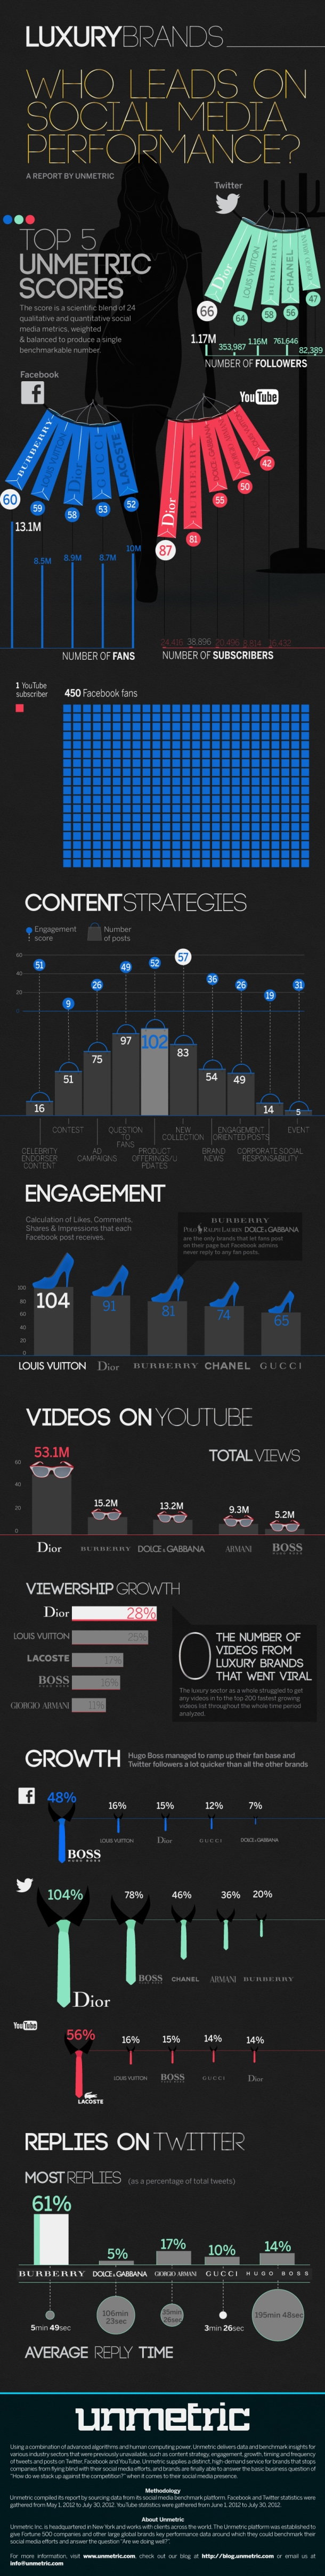 luxury-brands-on-social-media_50c6a84b661b7